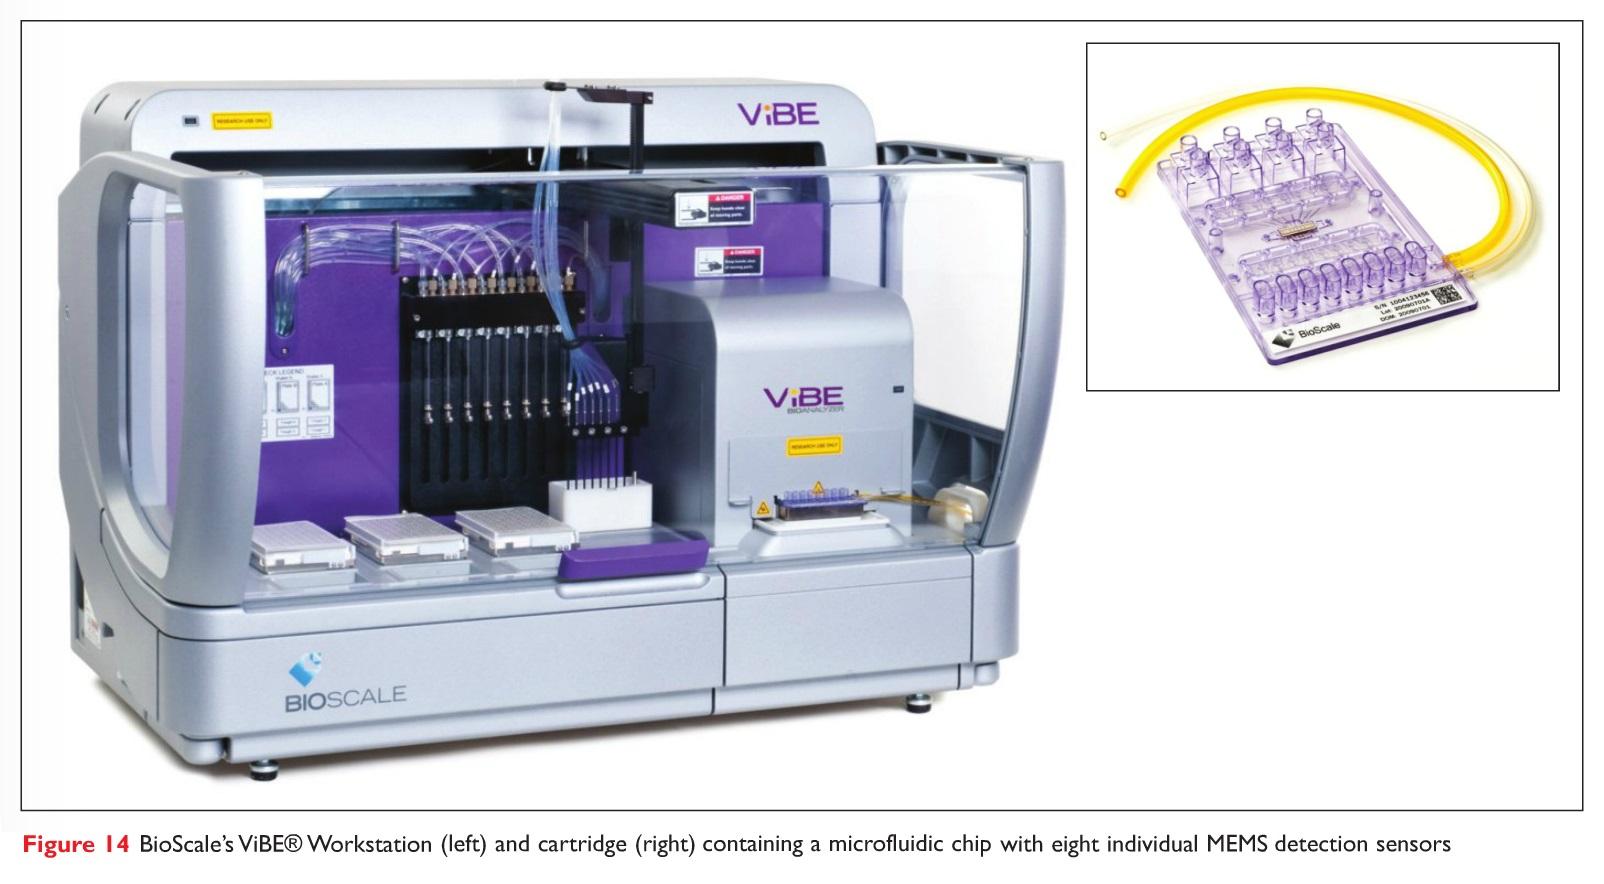 Figure 14 BioScale's ViBE Workstation and cartridge